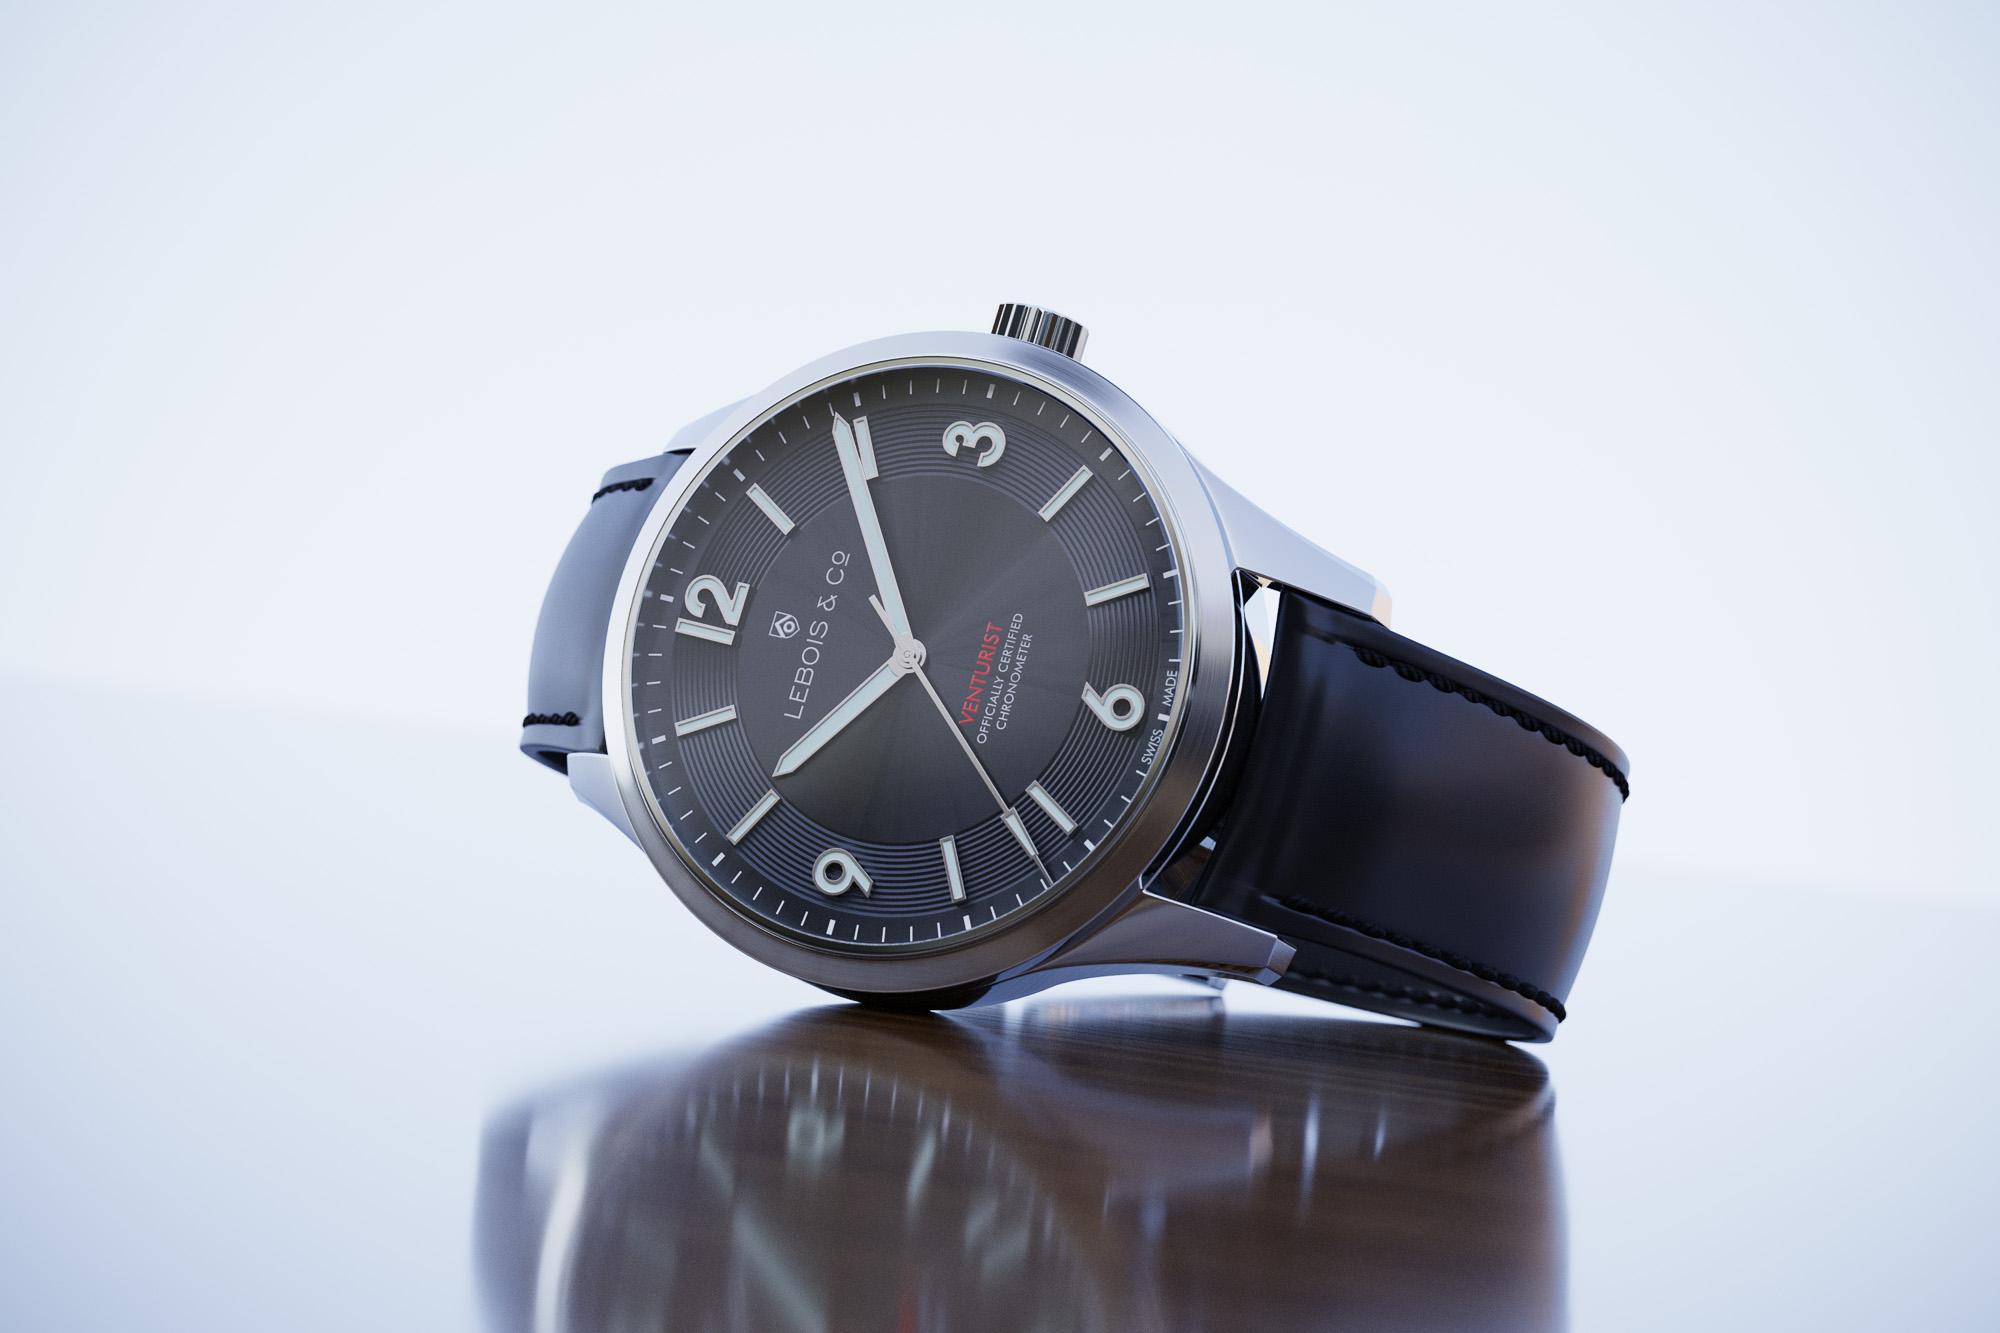 Lebois and Co Venturist Chronometer watch